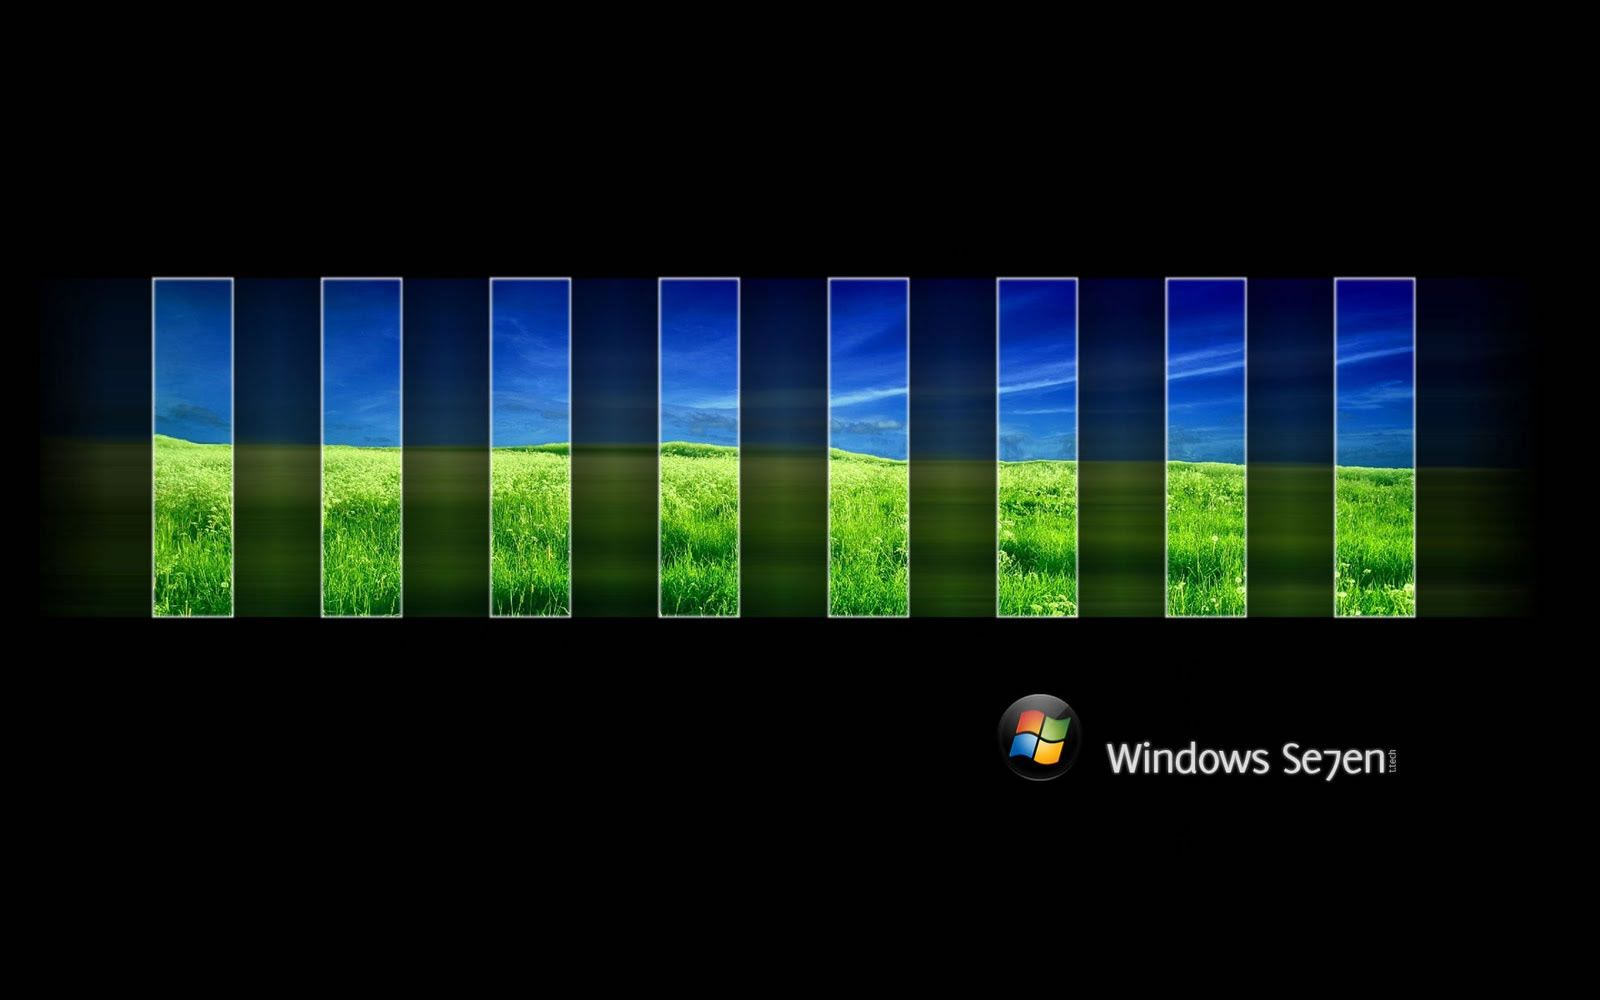 Must see Wallpaper High Quality Windows 7 - 280e21e3512823c482da73dfe5cc03fe  Pictures_347181.jpg